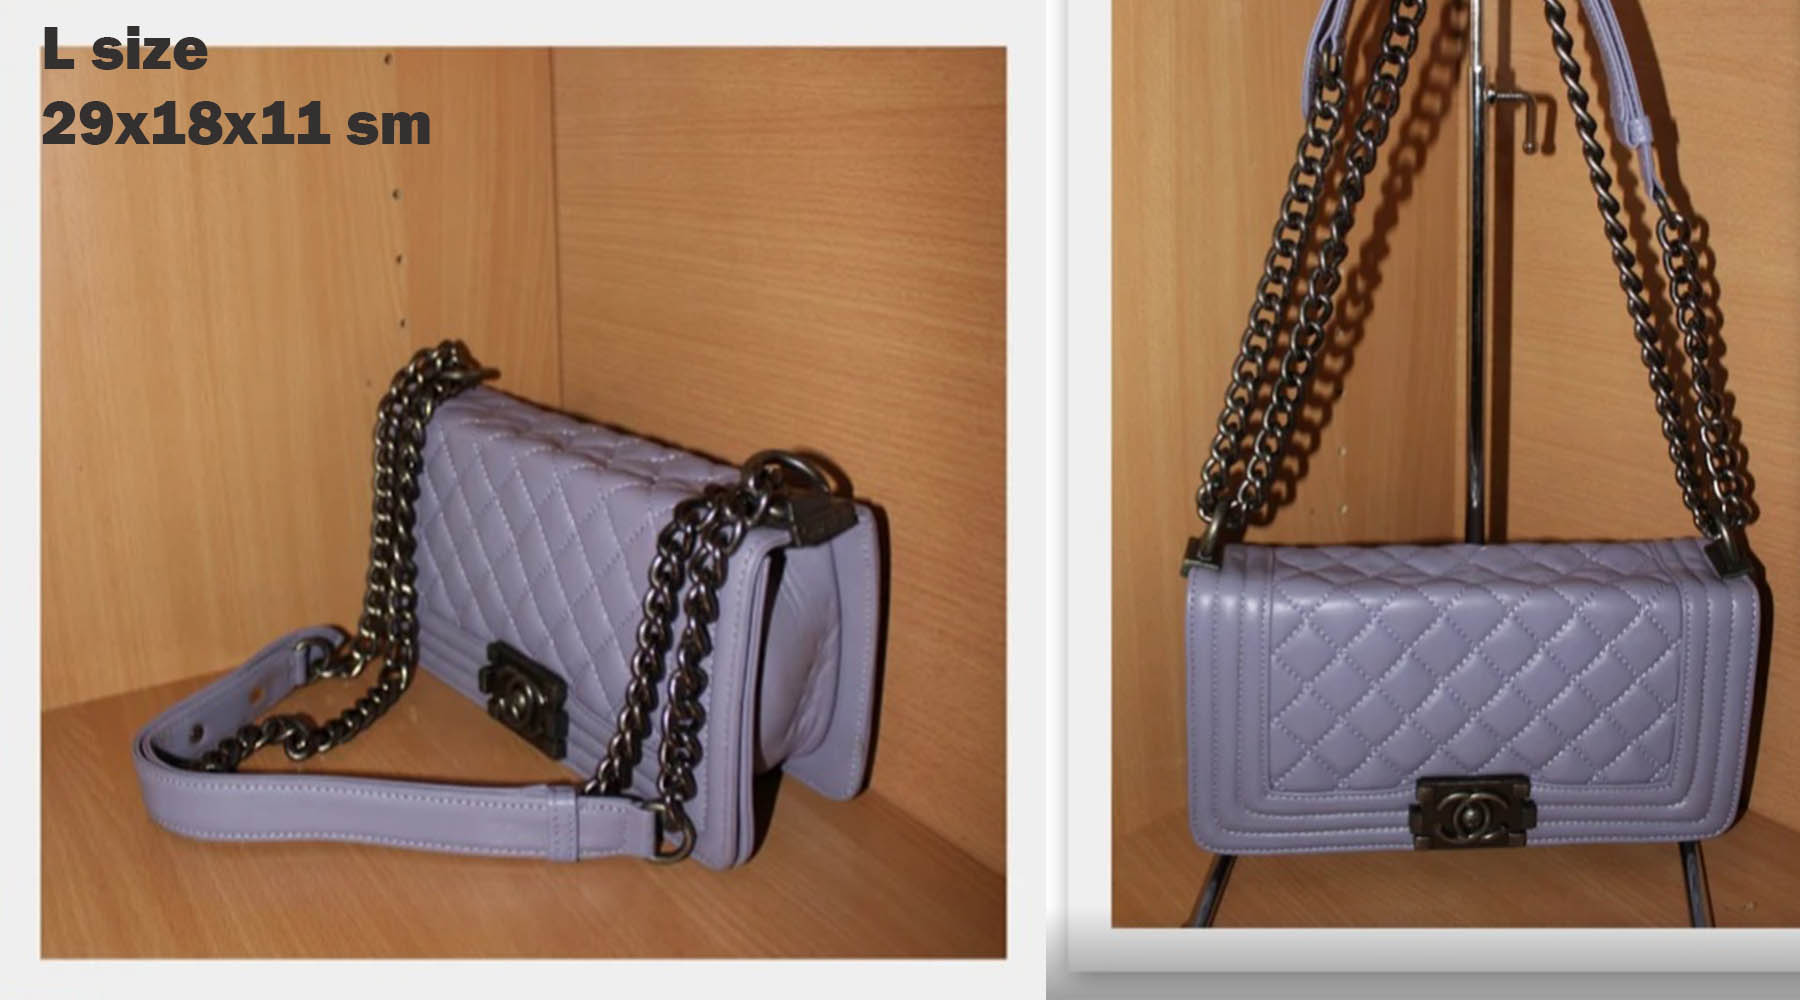 Дамска чанта ШАНЕЛ BLUE, L размер 29 х 18 х 11 см